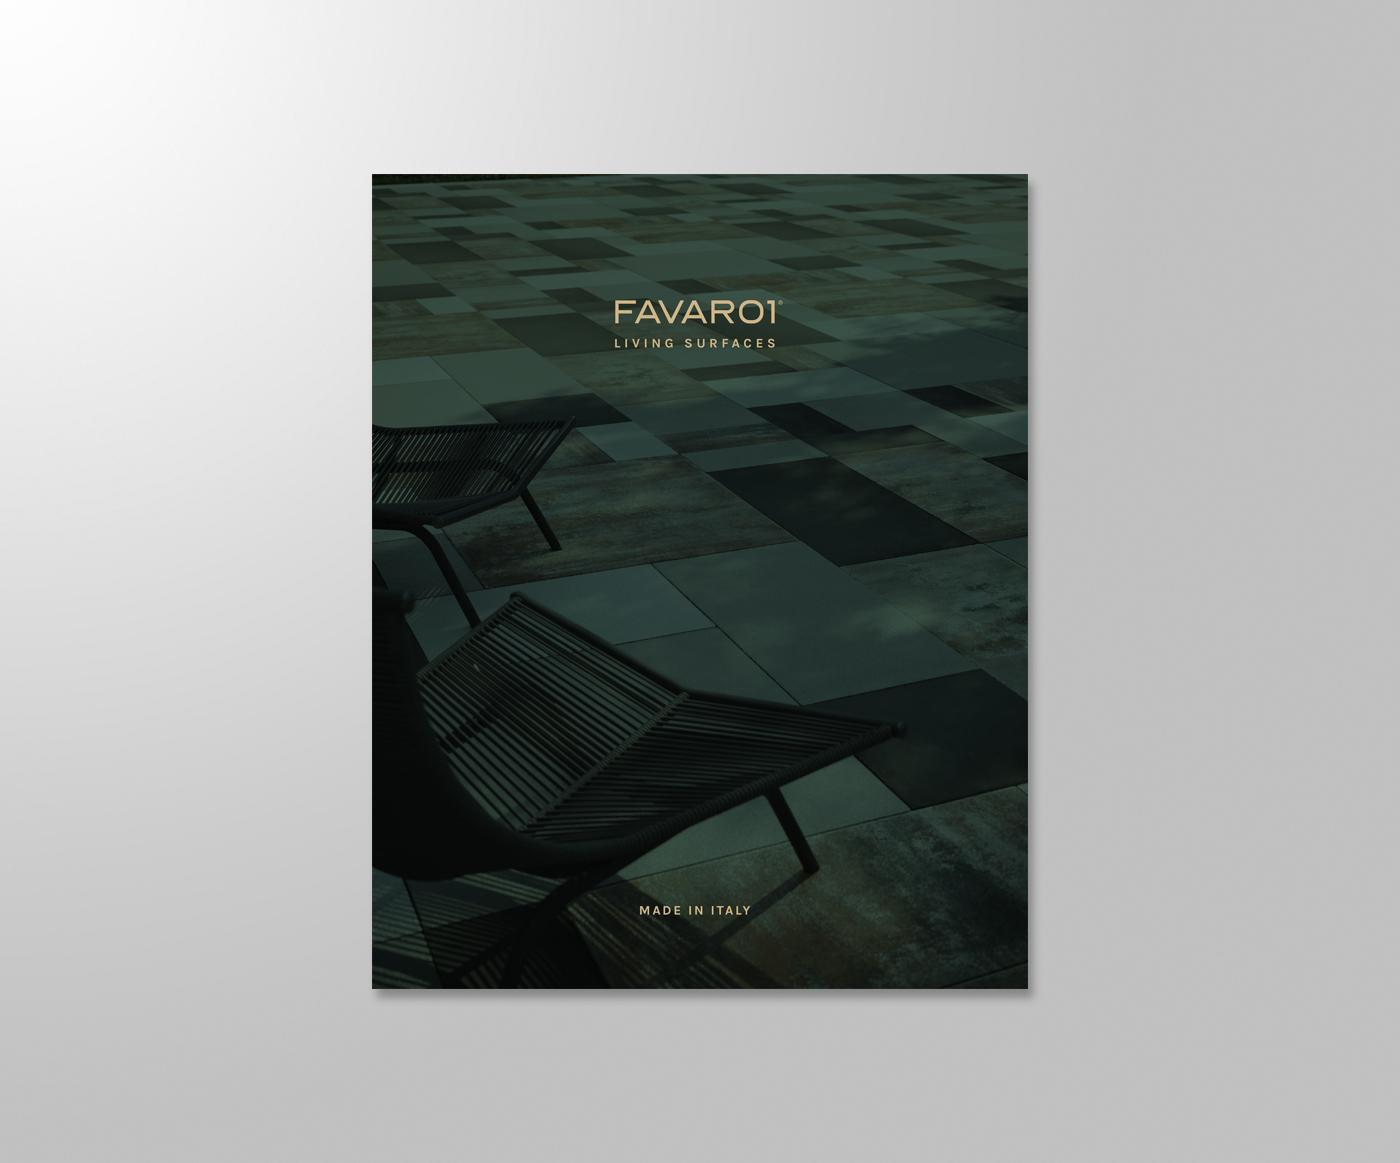 FAVARO1 - Living surfaces